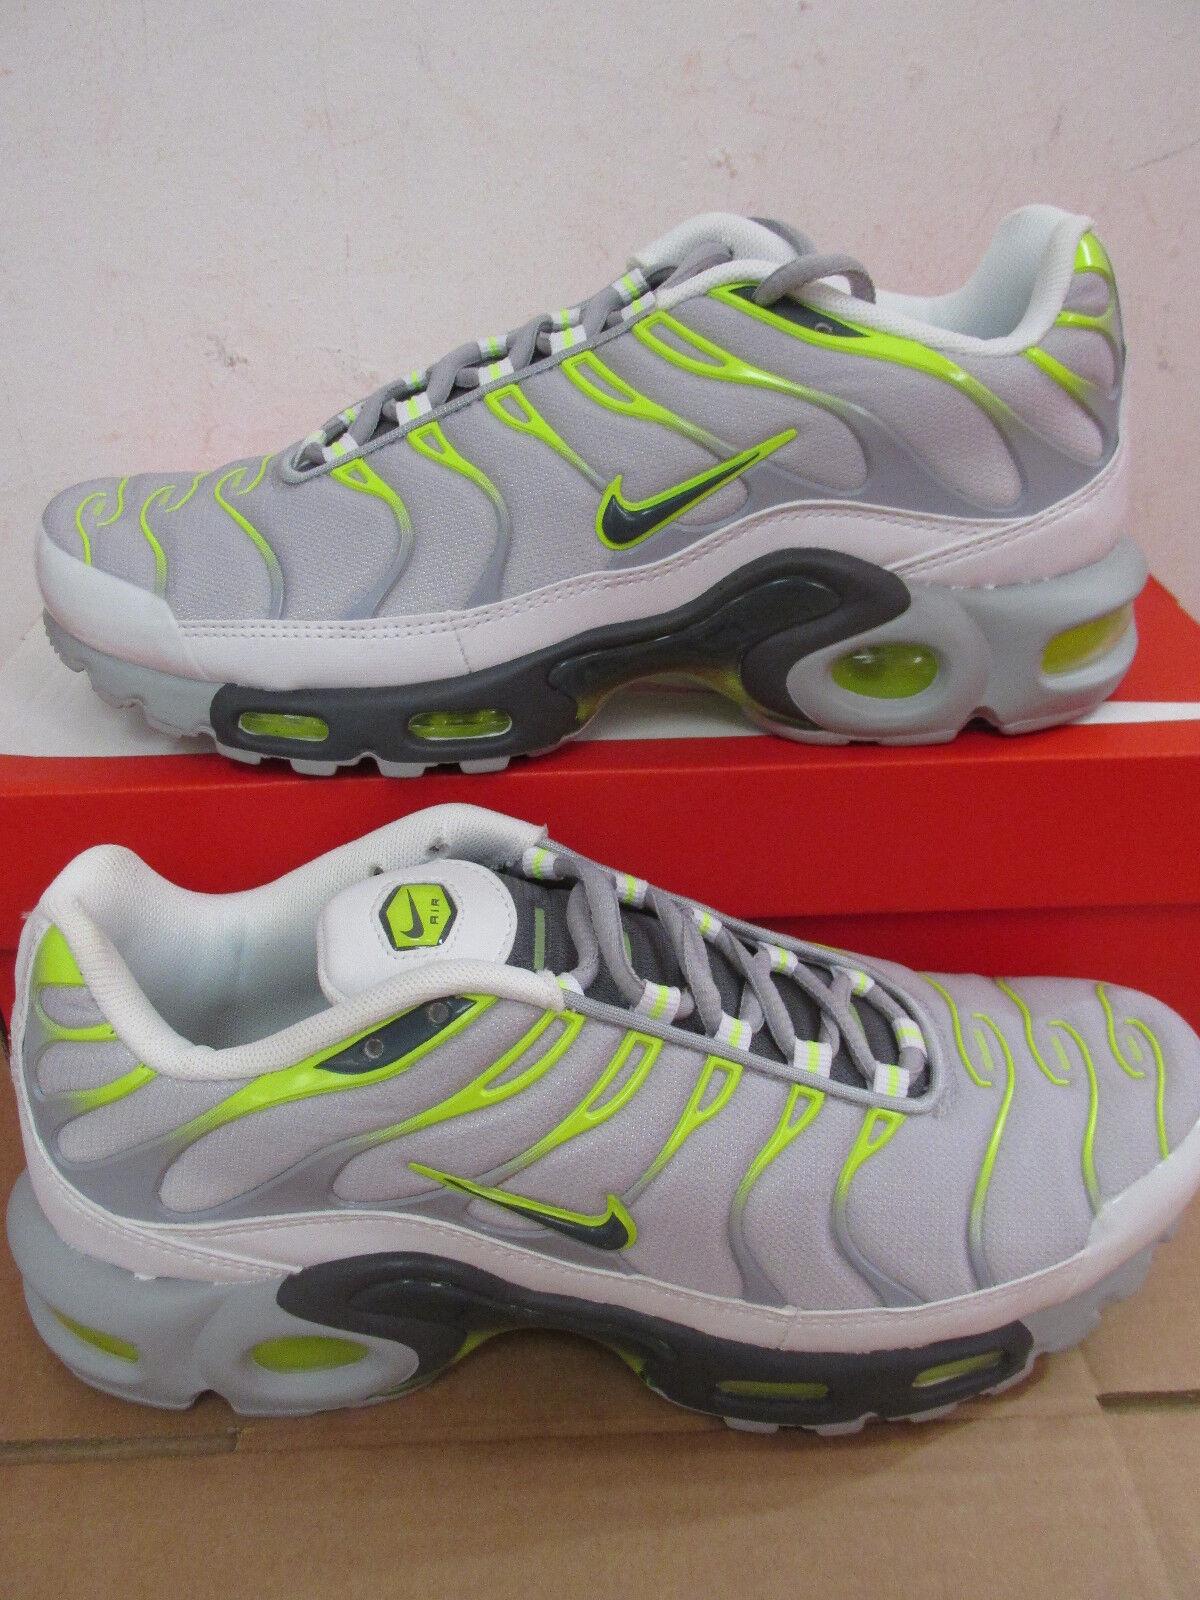 Nike Air Max Plus Mens Running Running Running Trainers 852630 003 Turnschuhe schuhe CLEARANCE bc3523